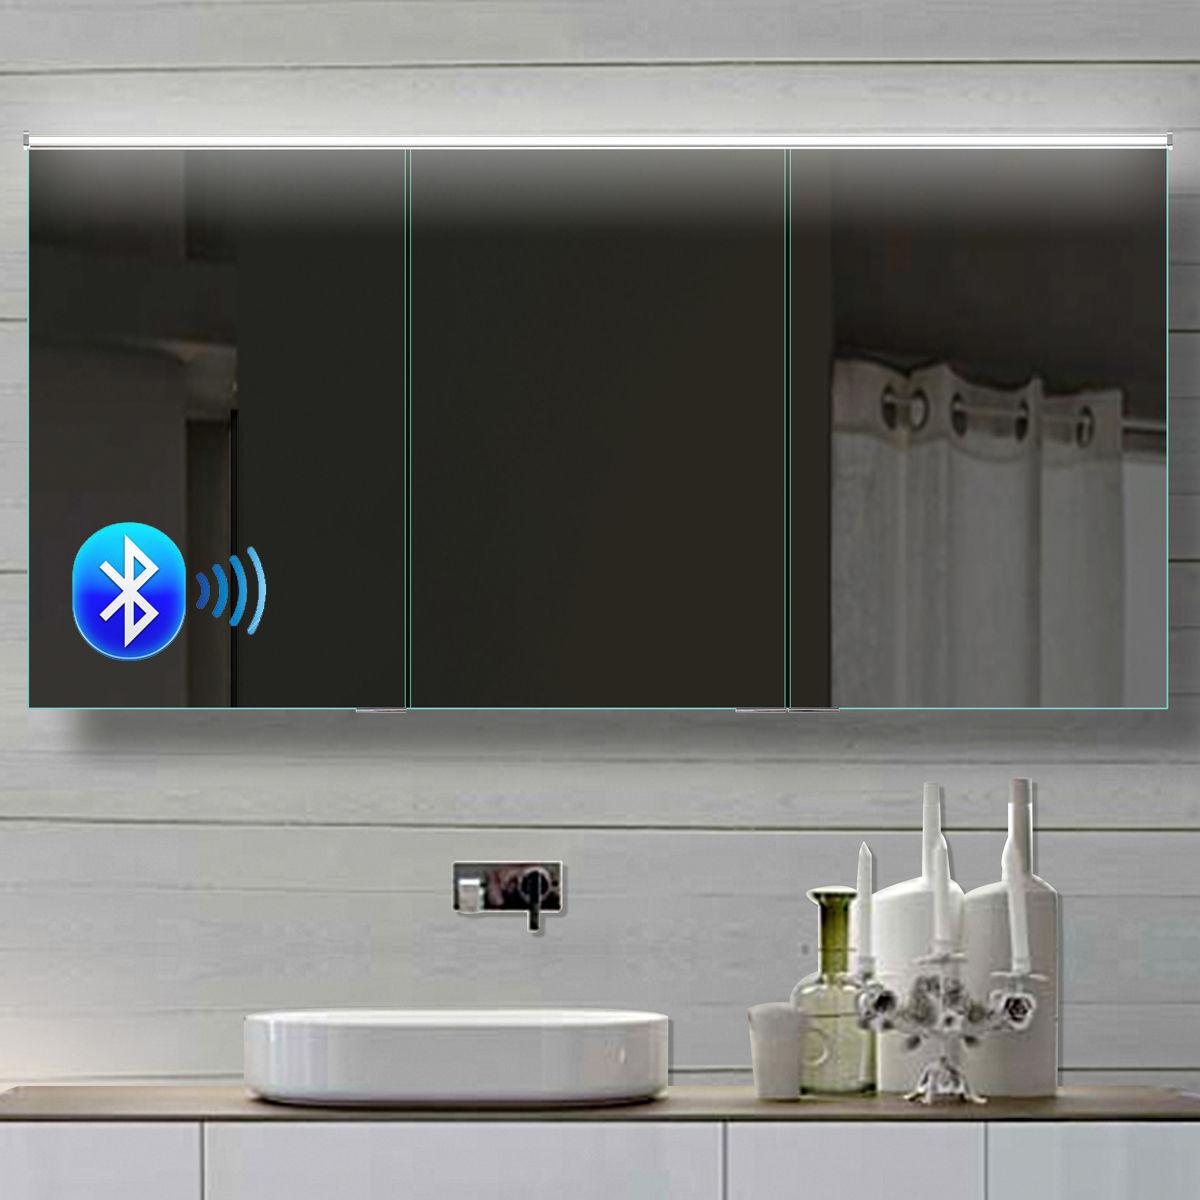 LED Spiegelschrank Badezimmer 142x70 cm, Bluetooth Kaltweiss ...